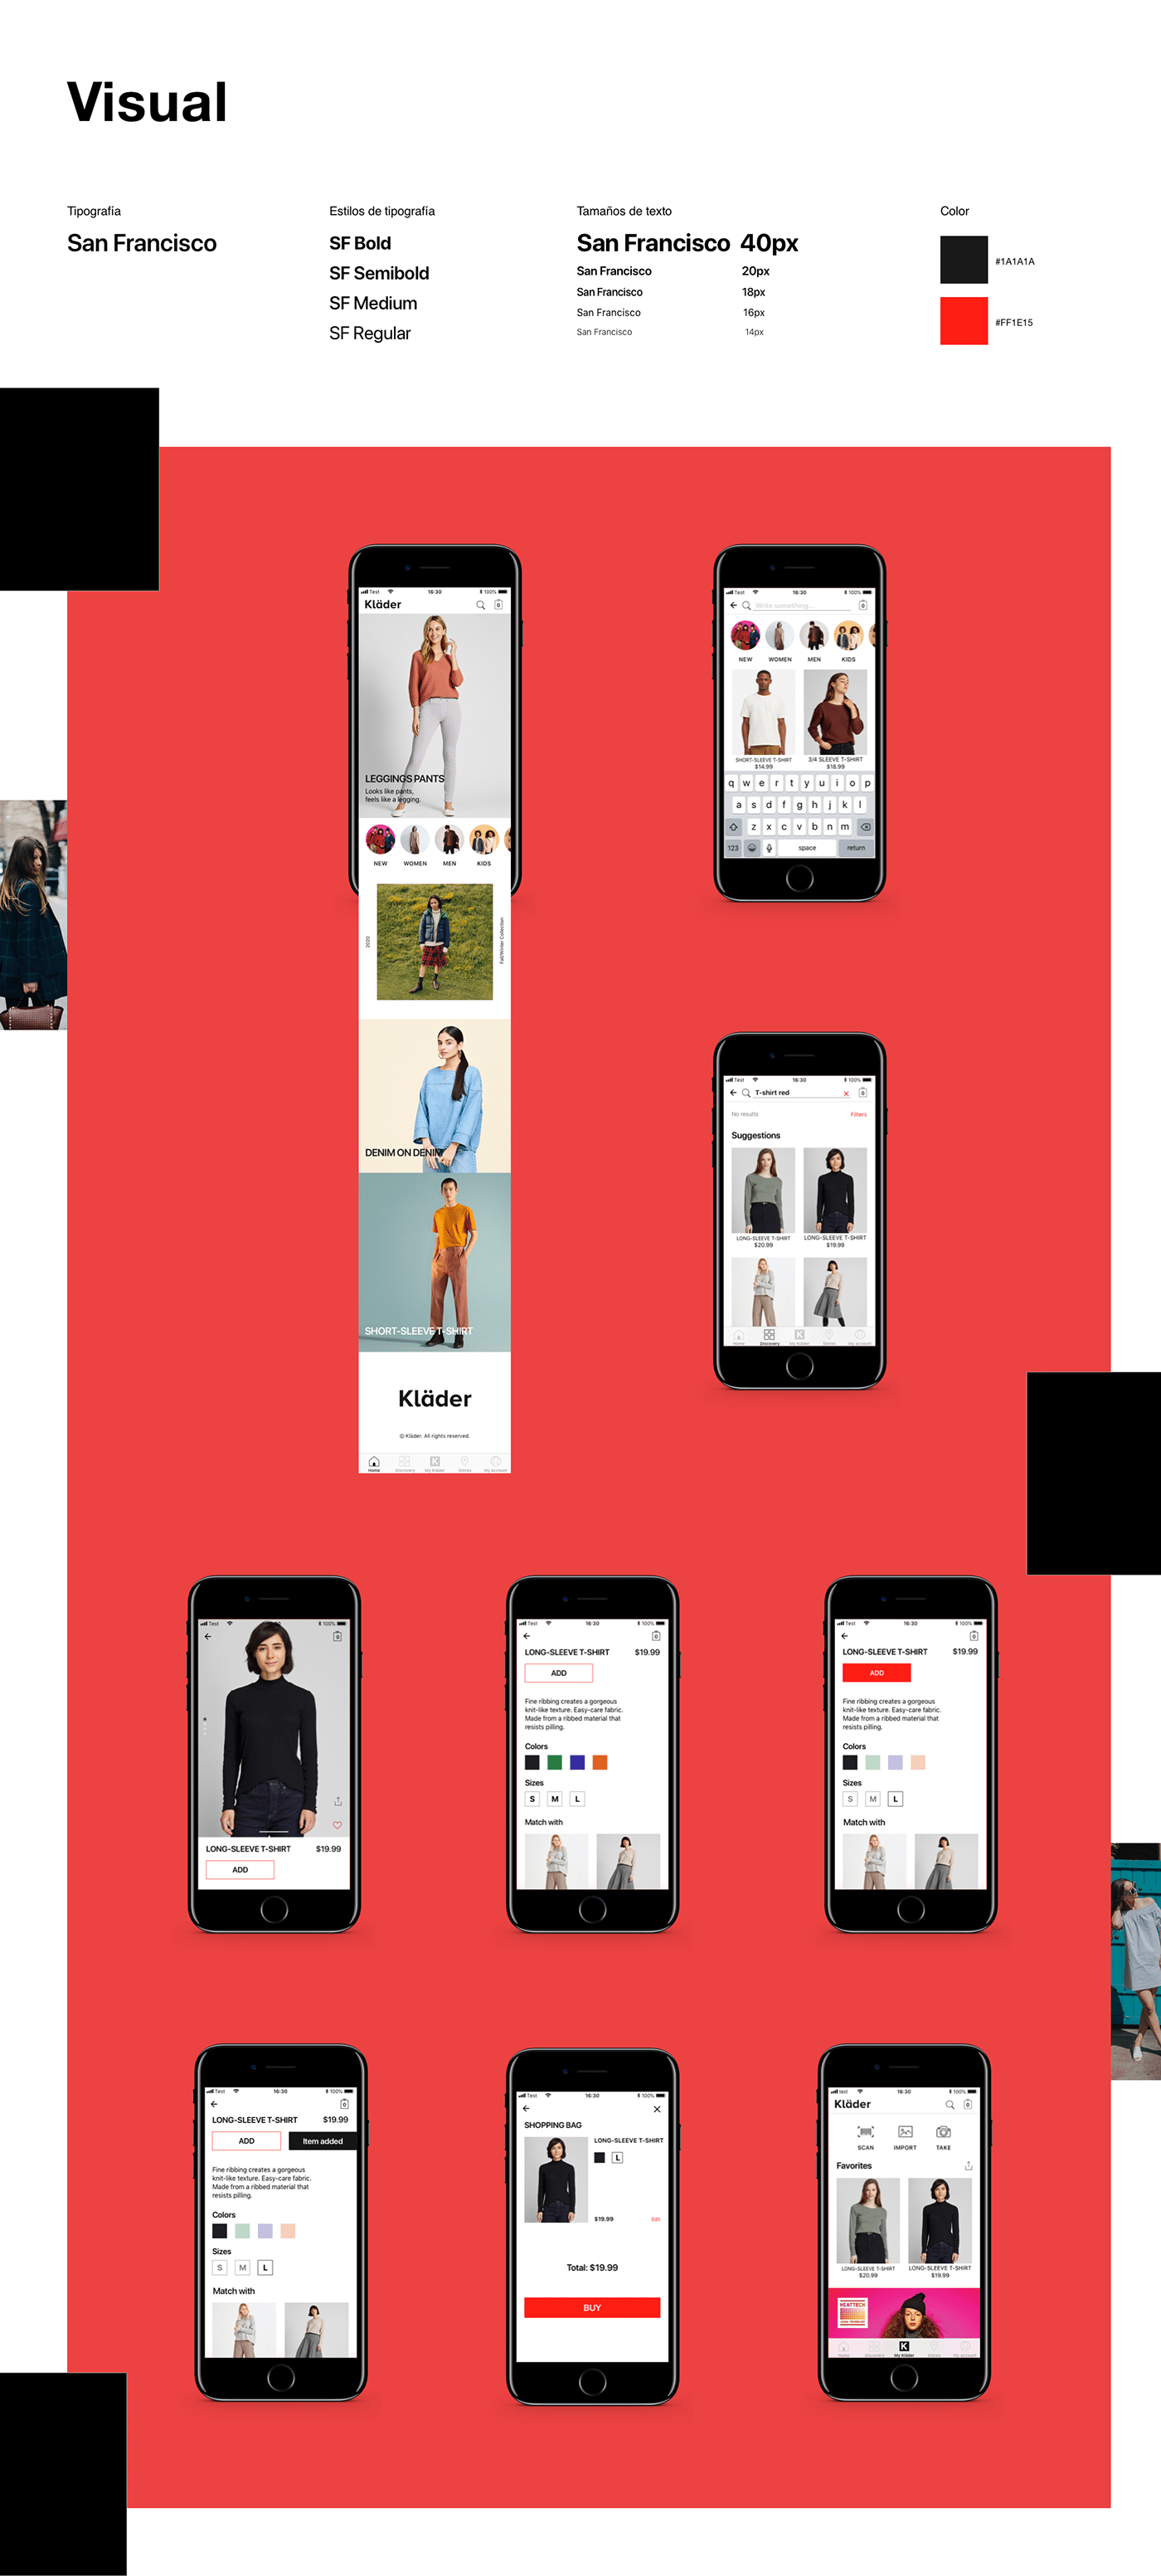 app e-commerce Fashion  interaction iosapp iphone motion photo UI ux